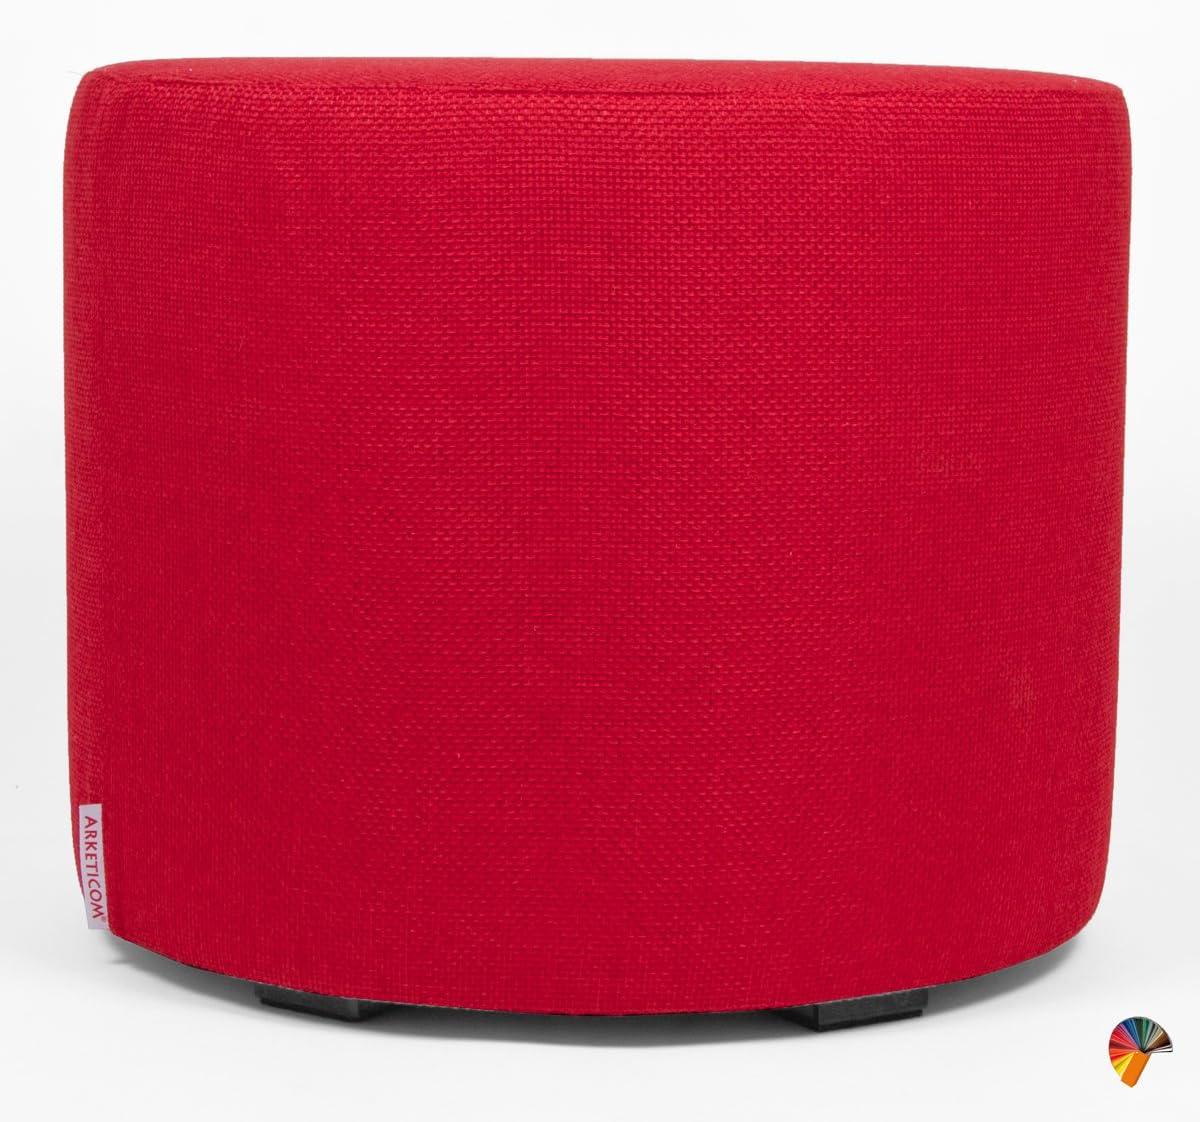 Arketicom CYLINDER Upholstered Footstool Ottoman Pouffe Chair Modern Stool round Pouf Italian Handmade Pink 35x35 cm